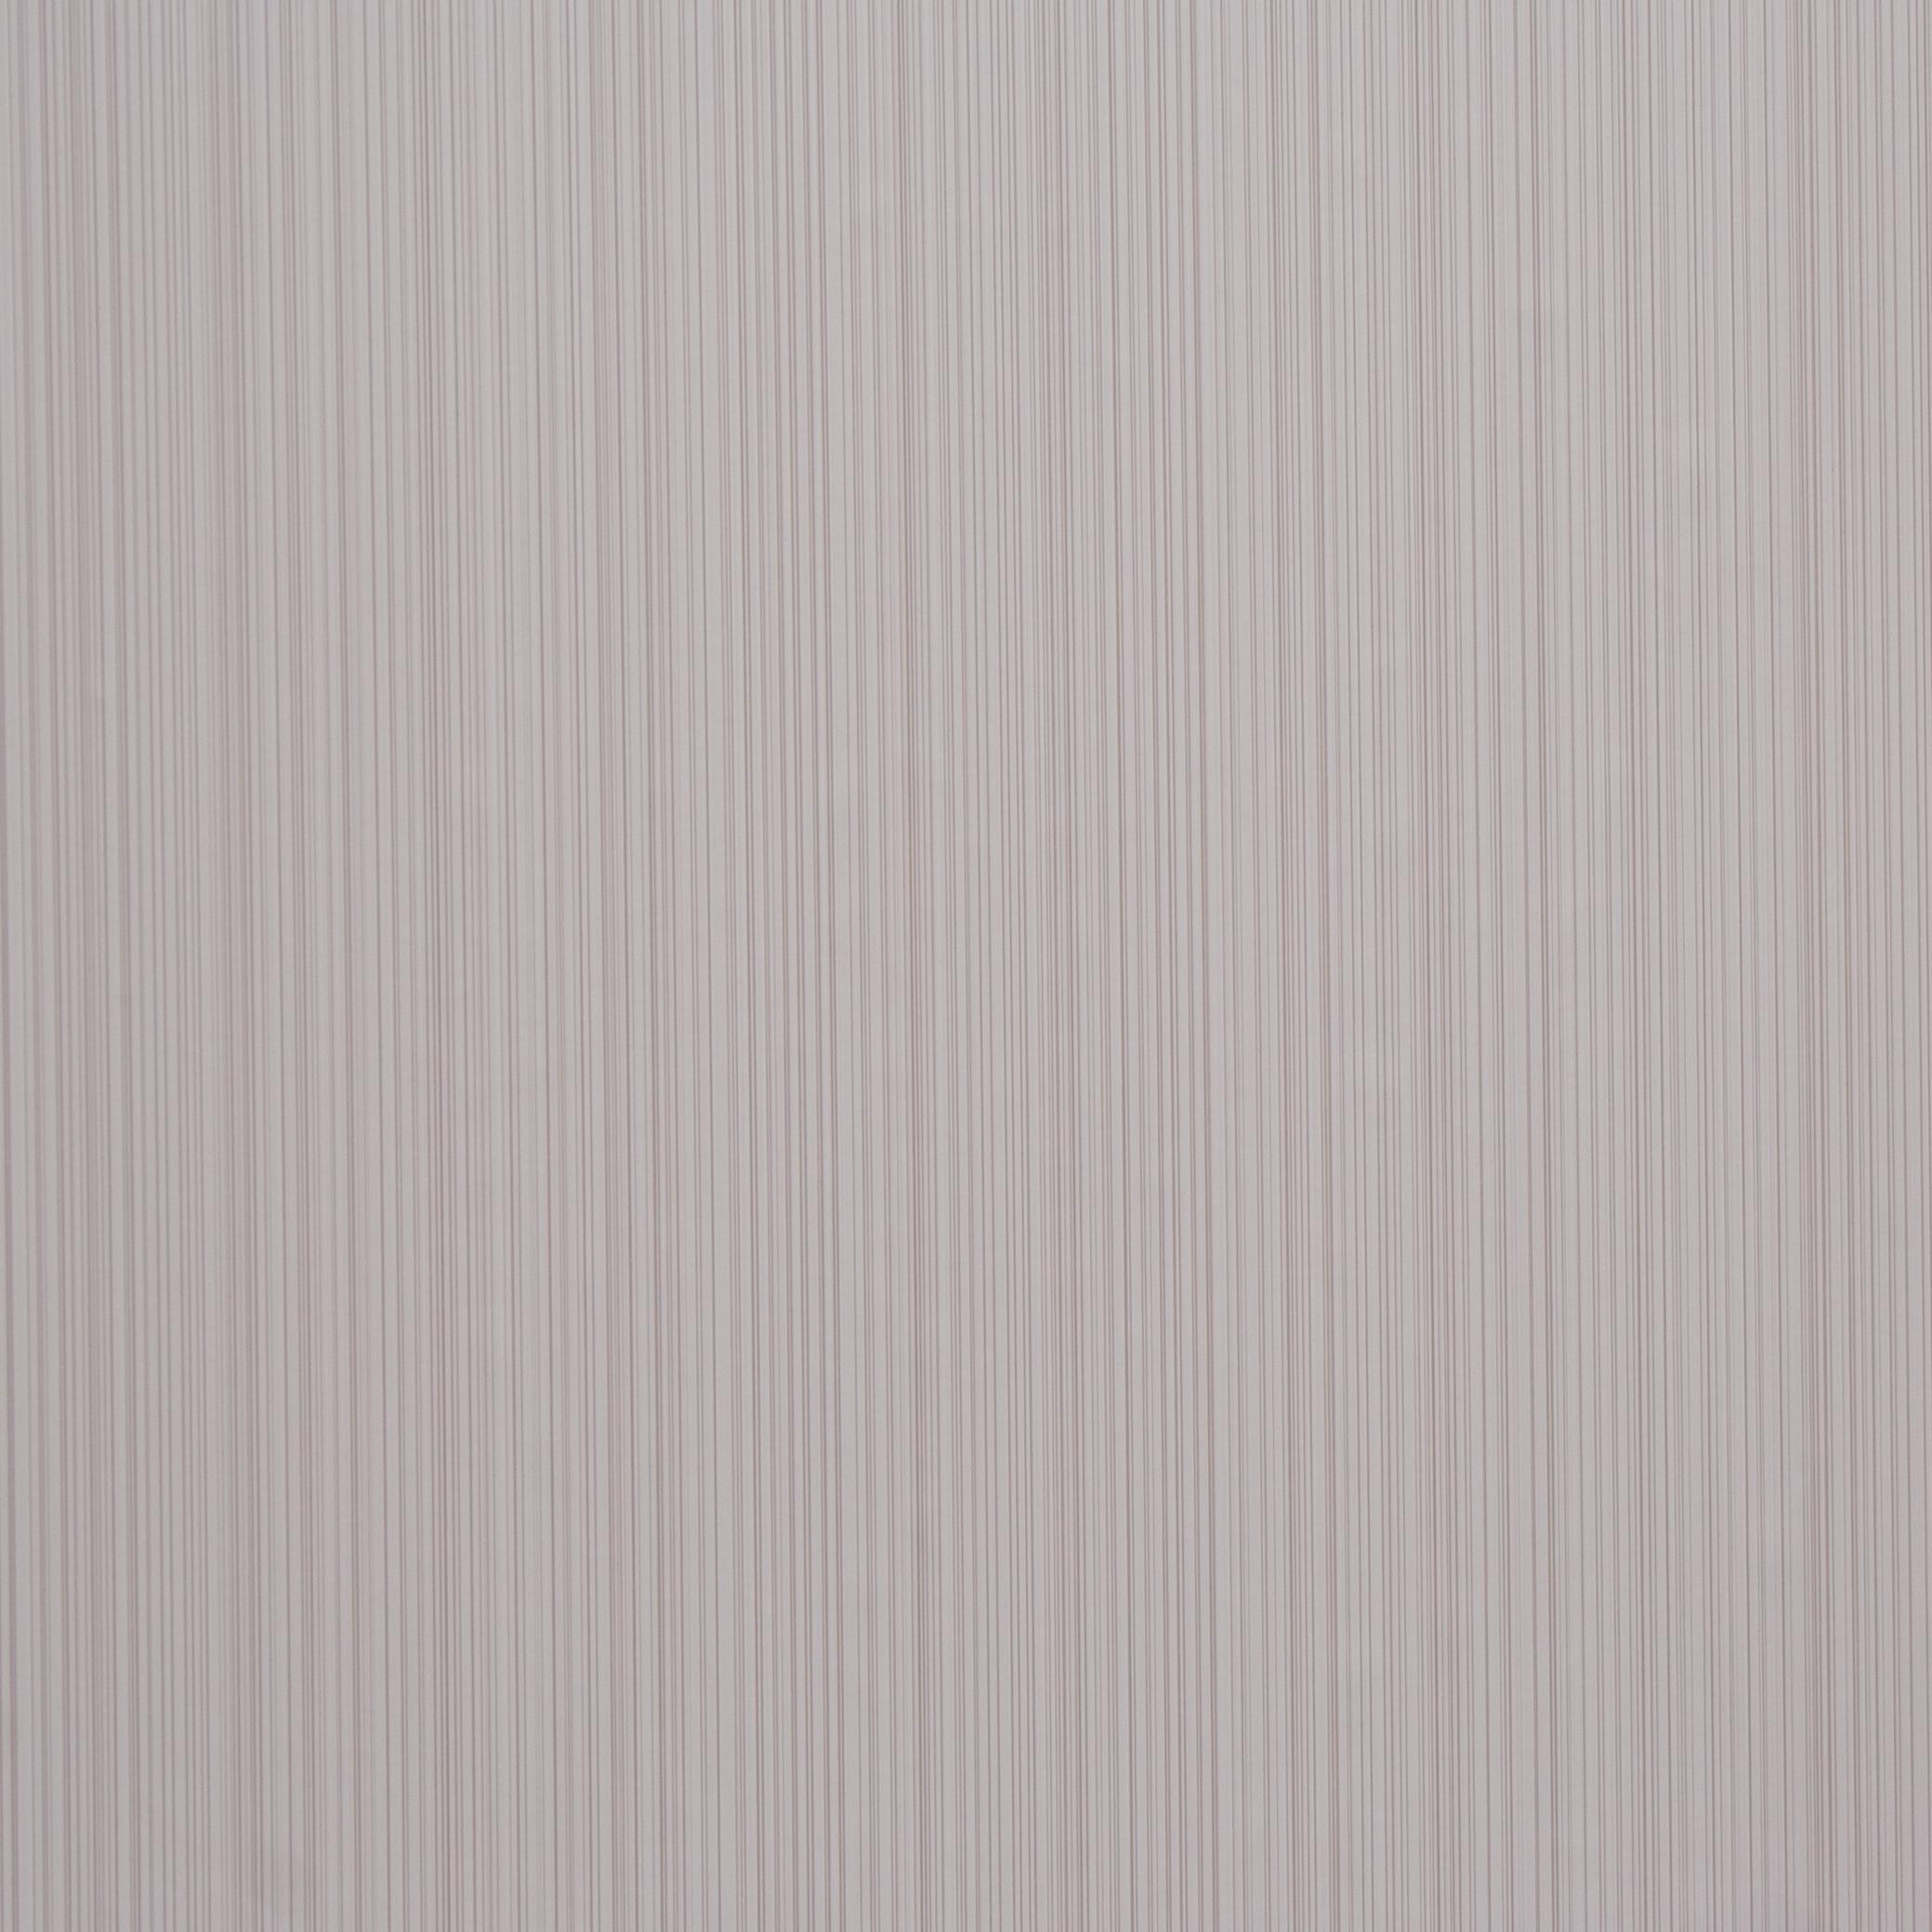 Обои  BN International,  коллекция Colour Line, артикул49111